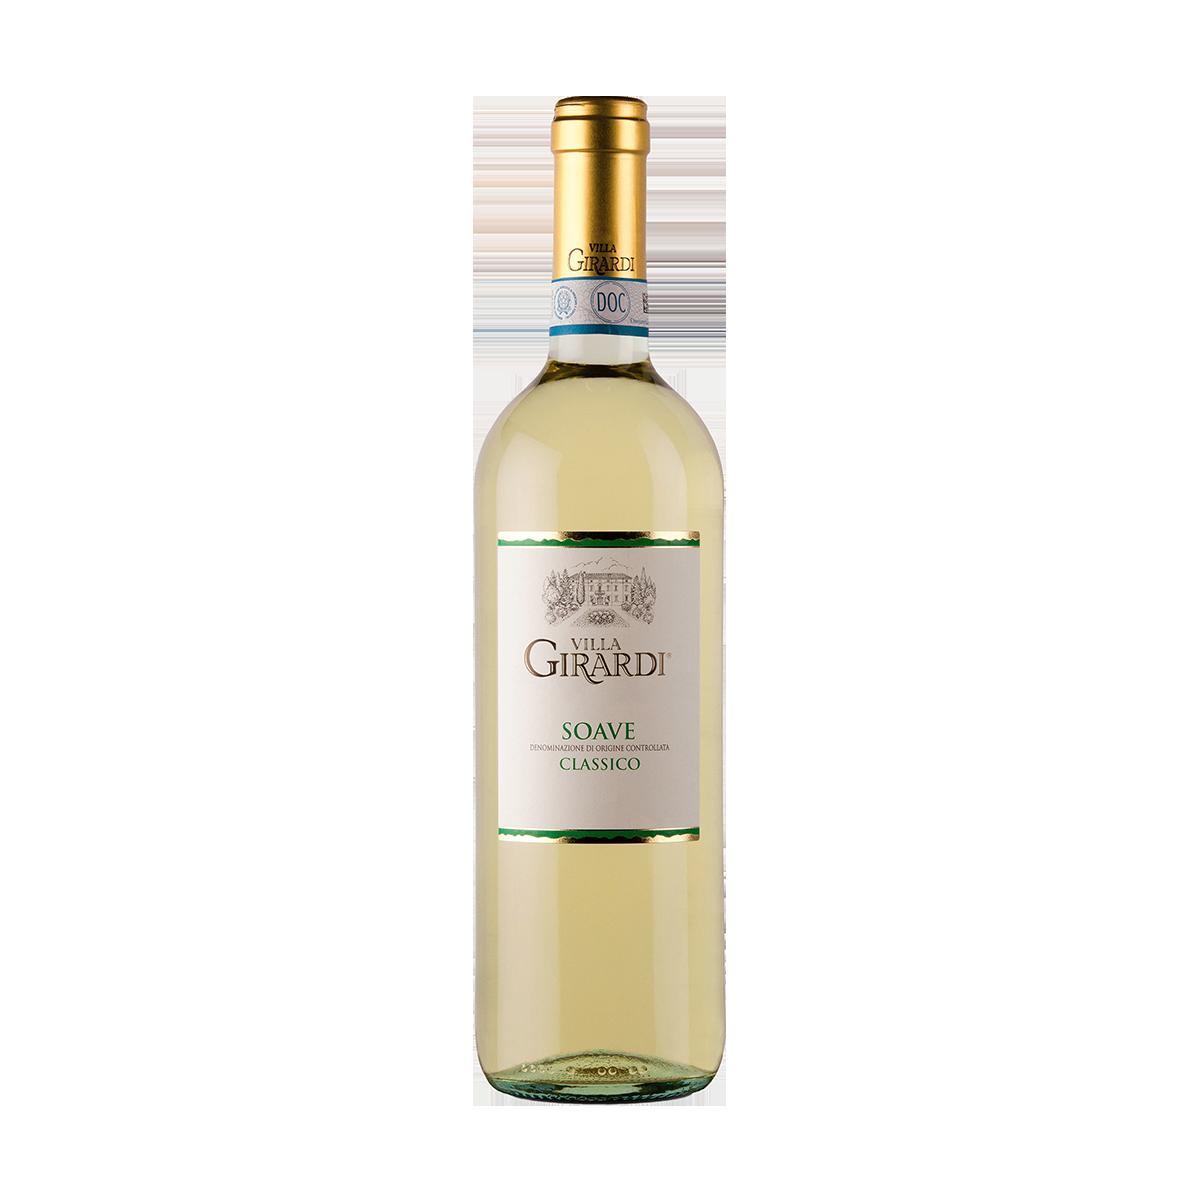 ITVG2101-18 義大利吉拉迪經典索亞飛白葡萄酒 Villa Girardi Soave D.O.C. Classico